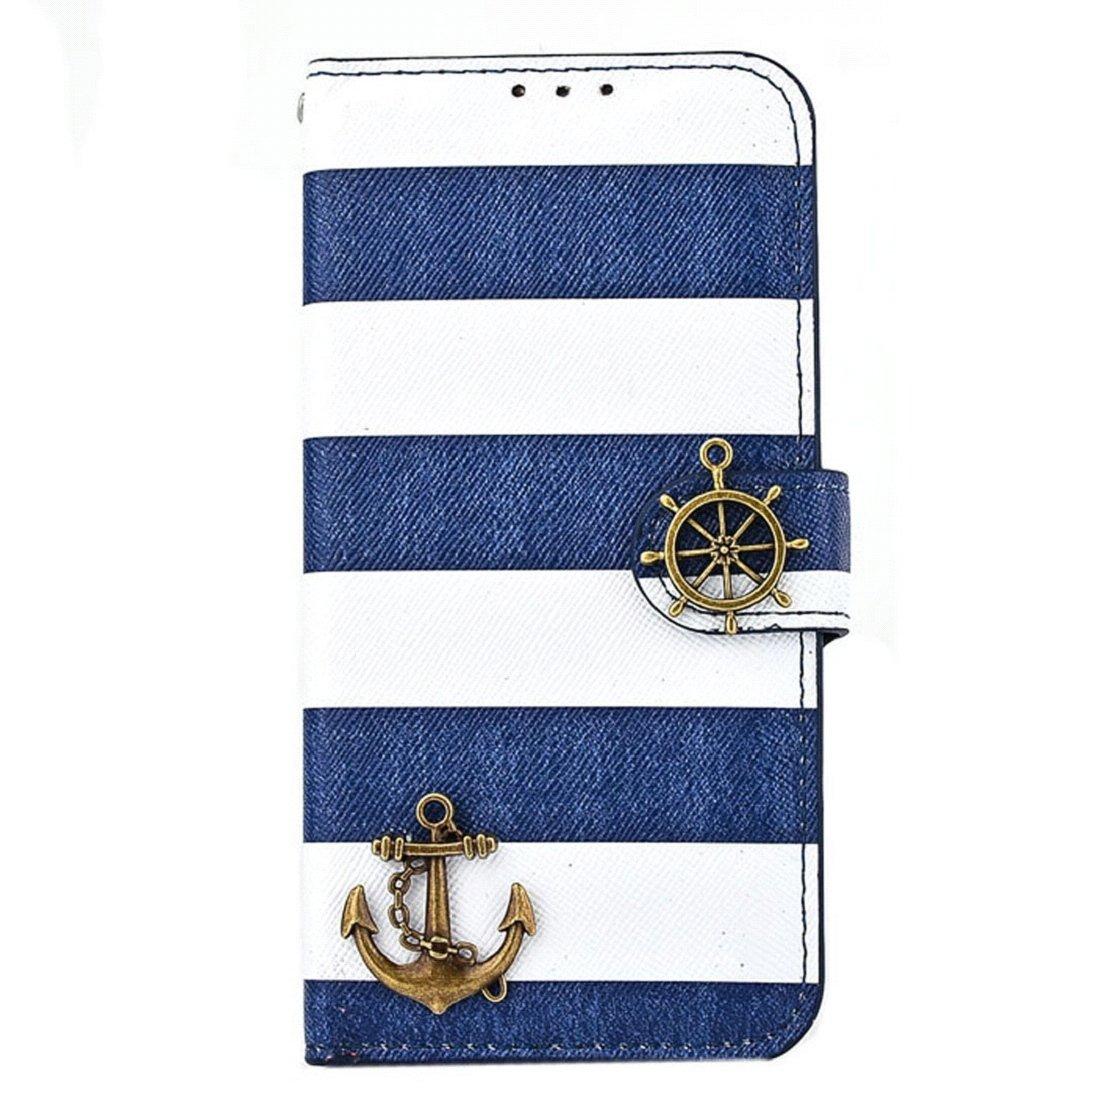 Stripes Anchor Rudder Wallet Flip Case Cover For iphone 6 4.7 Inch (Blue)